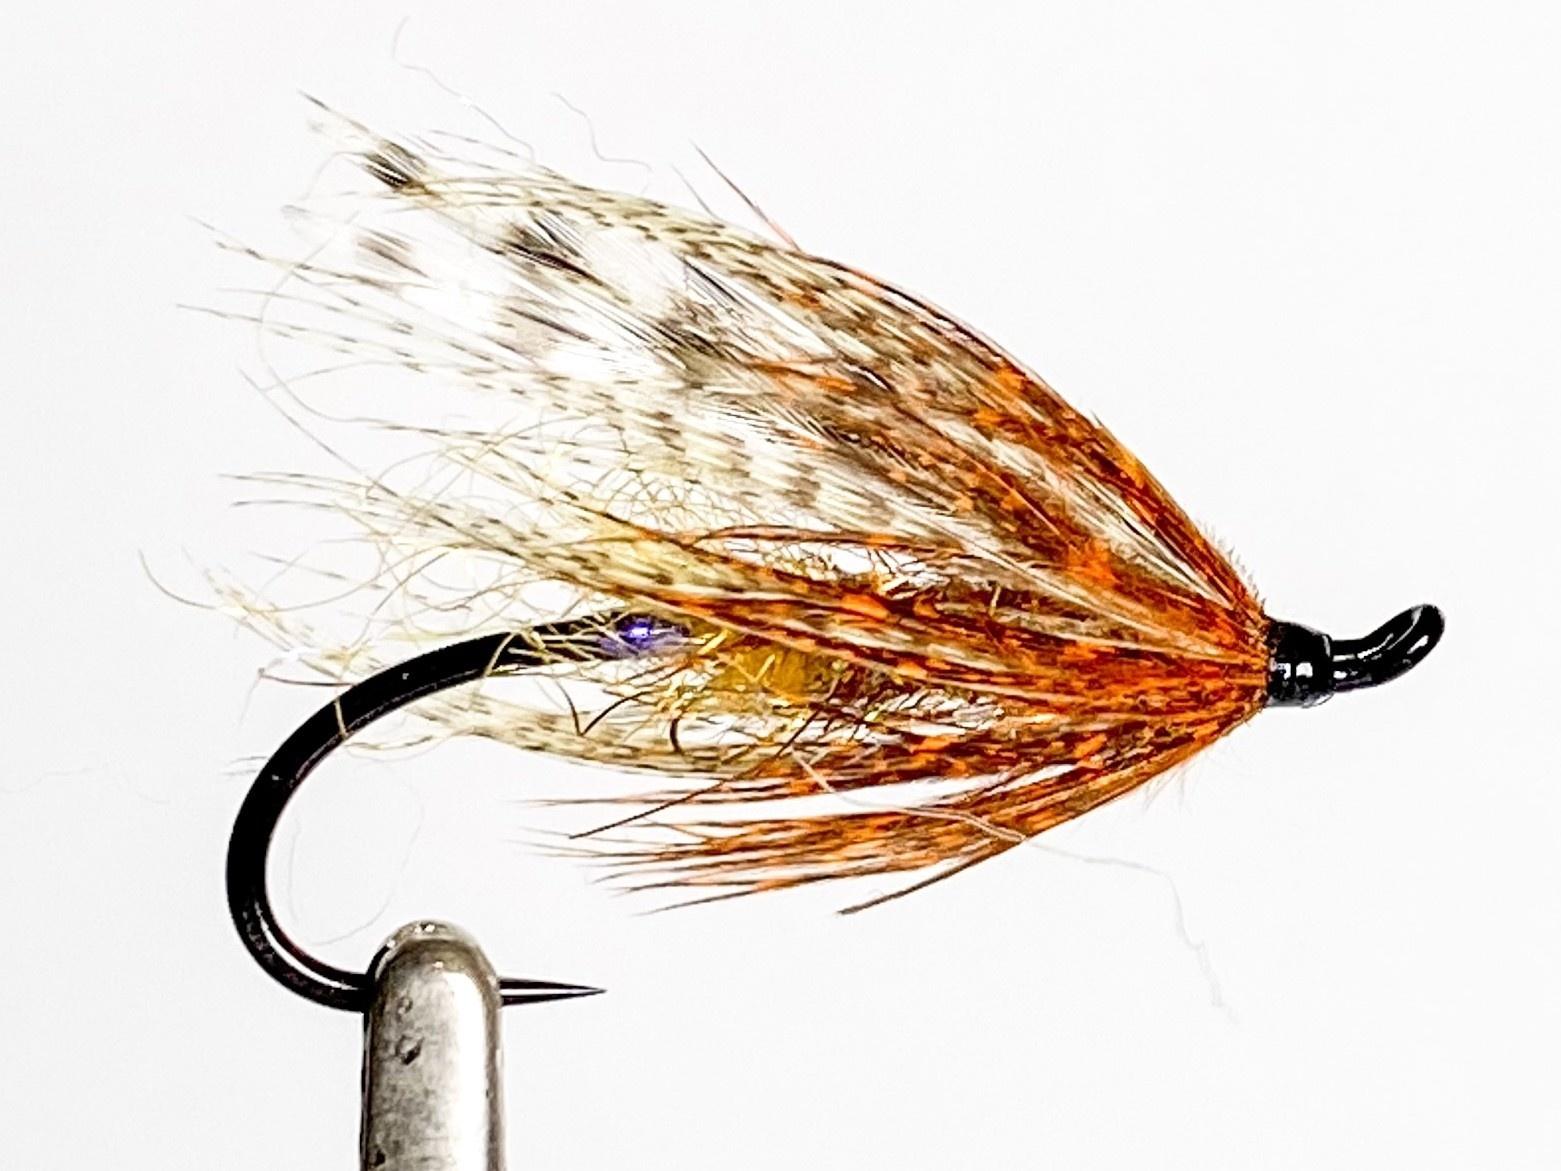 Aqua Flies Hartwick's Brown Hilton Brown/Orange size 6